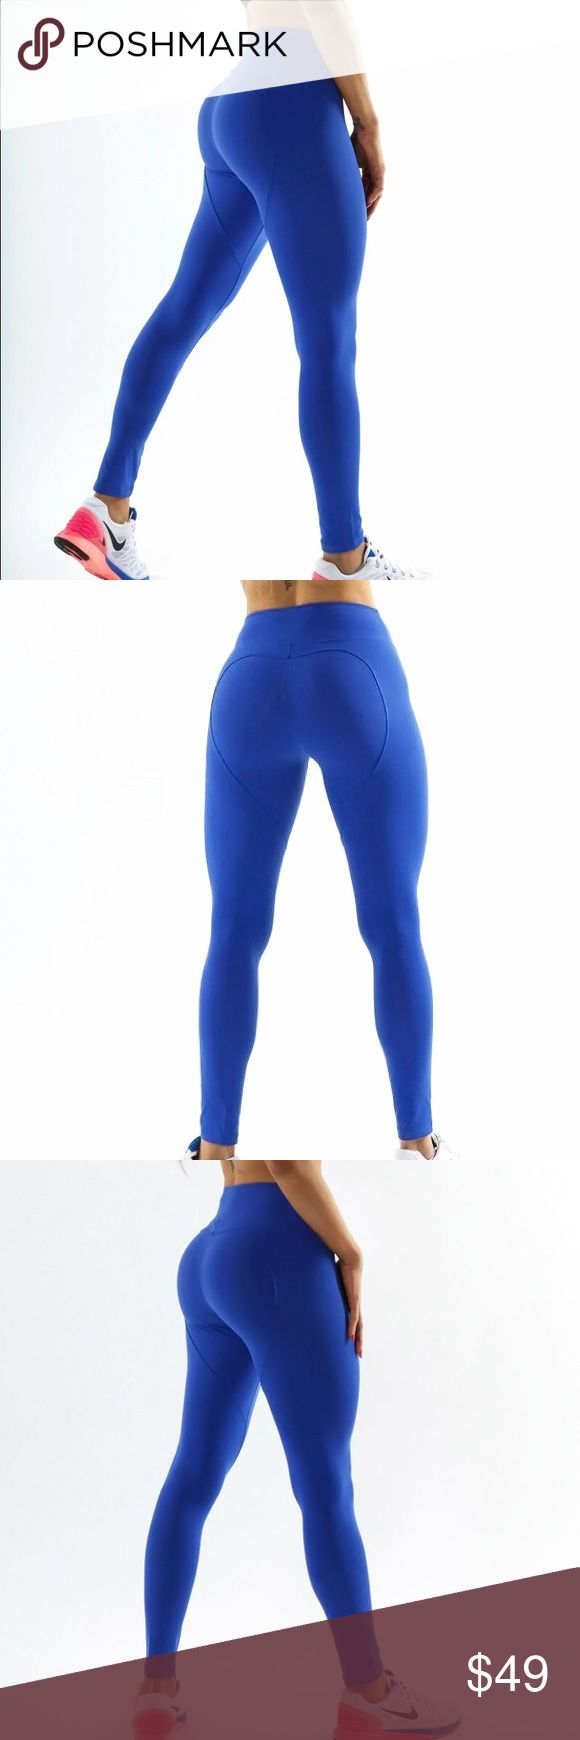 Royal Blue Leggings Description from manufacturers website: Heart Shape Buttoms  High Waisted Support  100% Supplex jfitness wear Pants Leggings